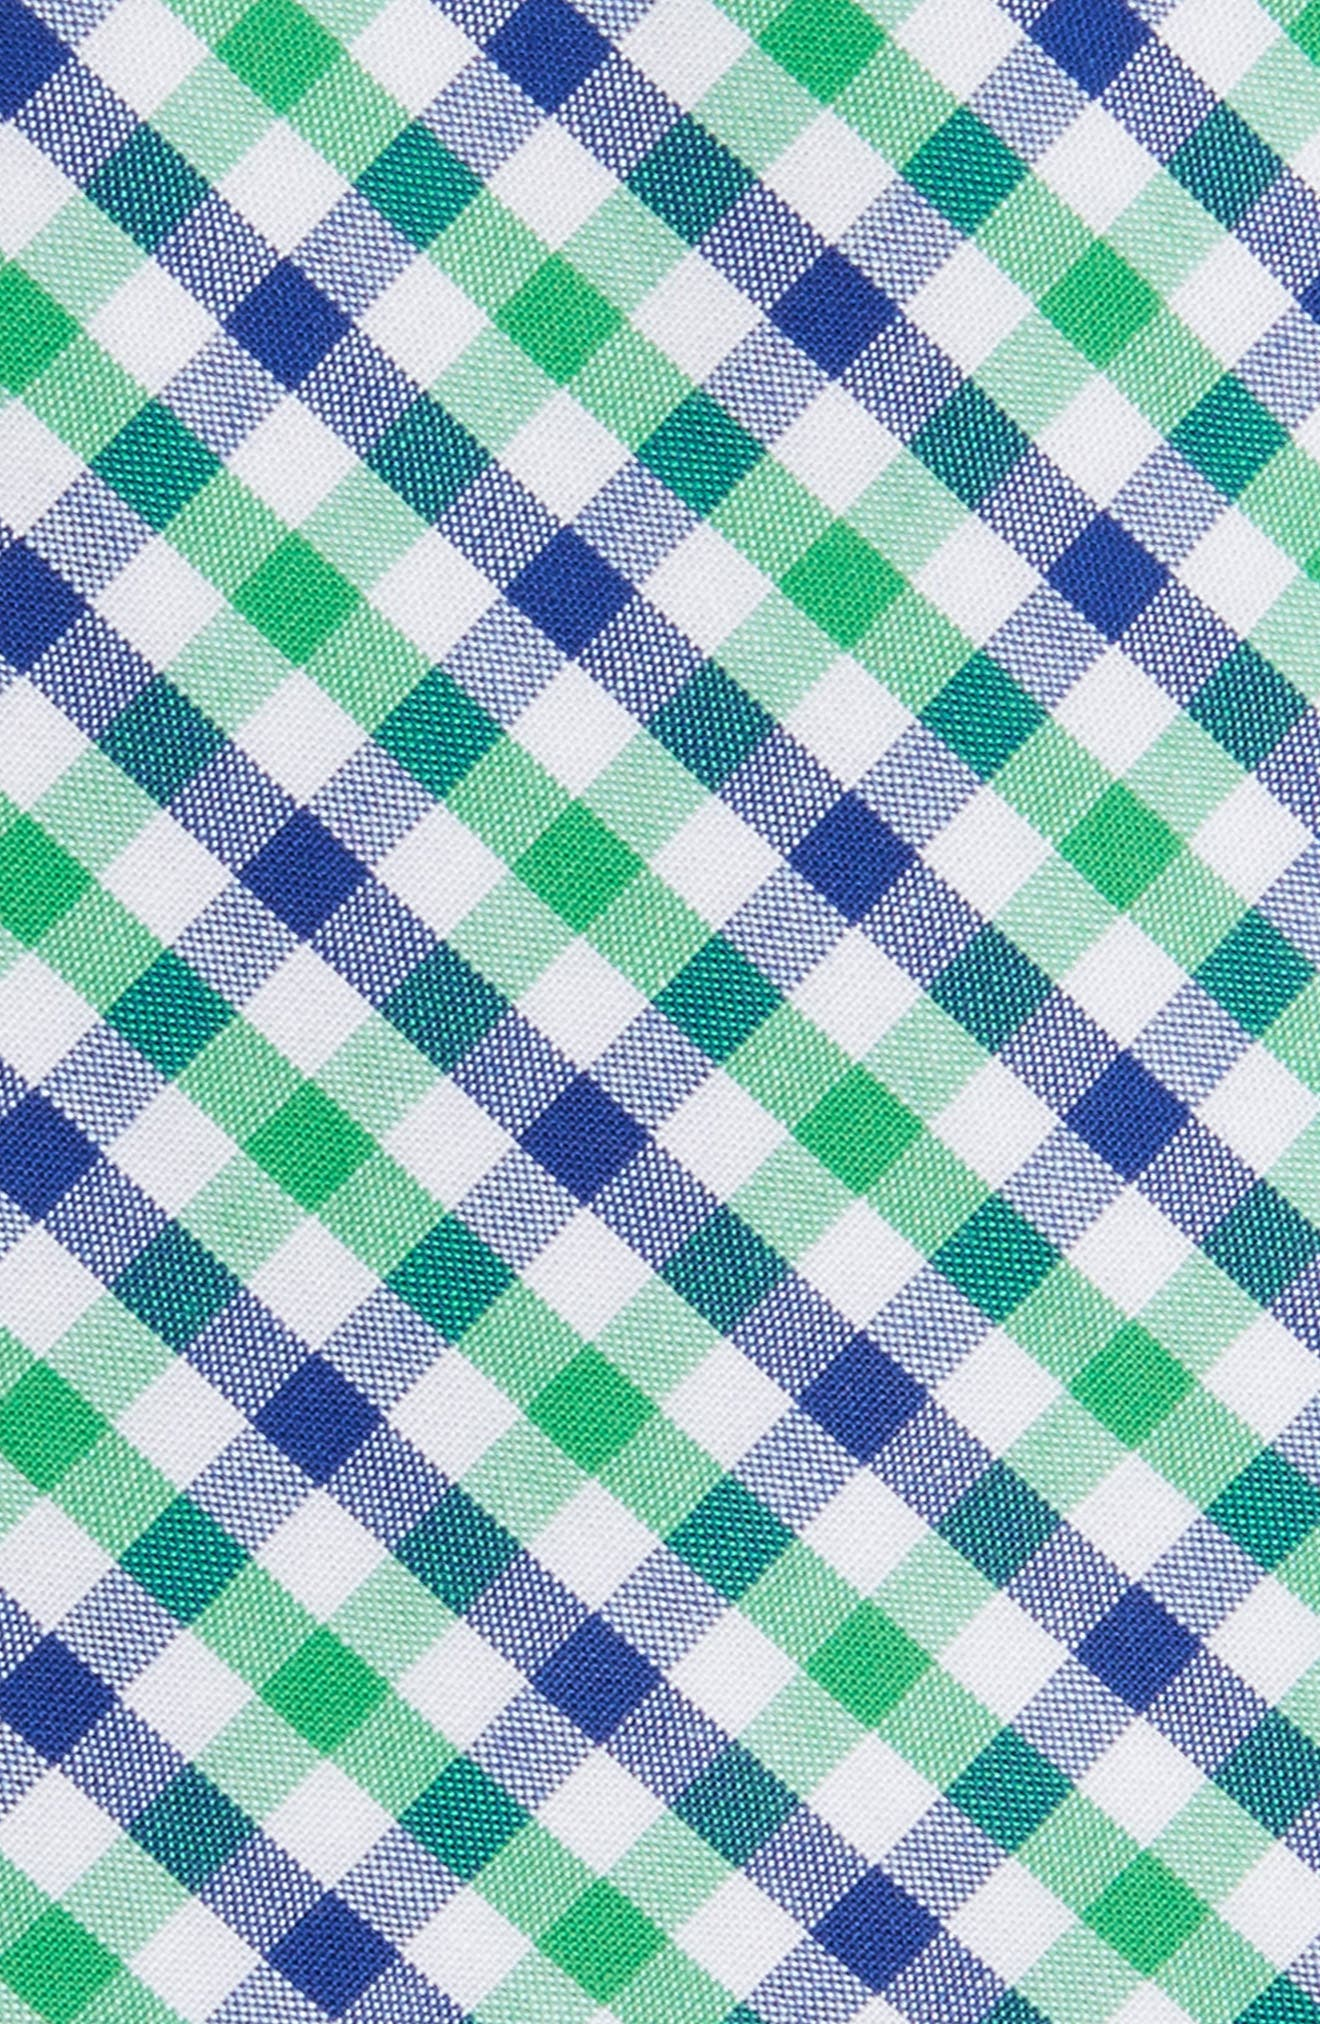 Robin Diamond Check Skinny Tie,                             Alternate thumbnail 6, color,